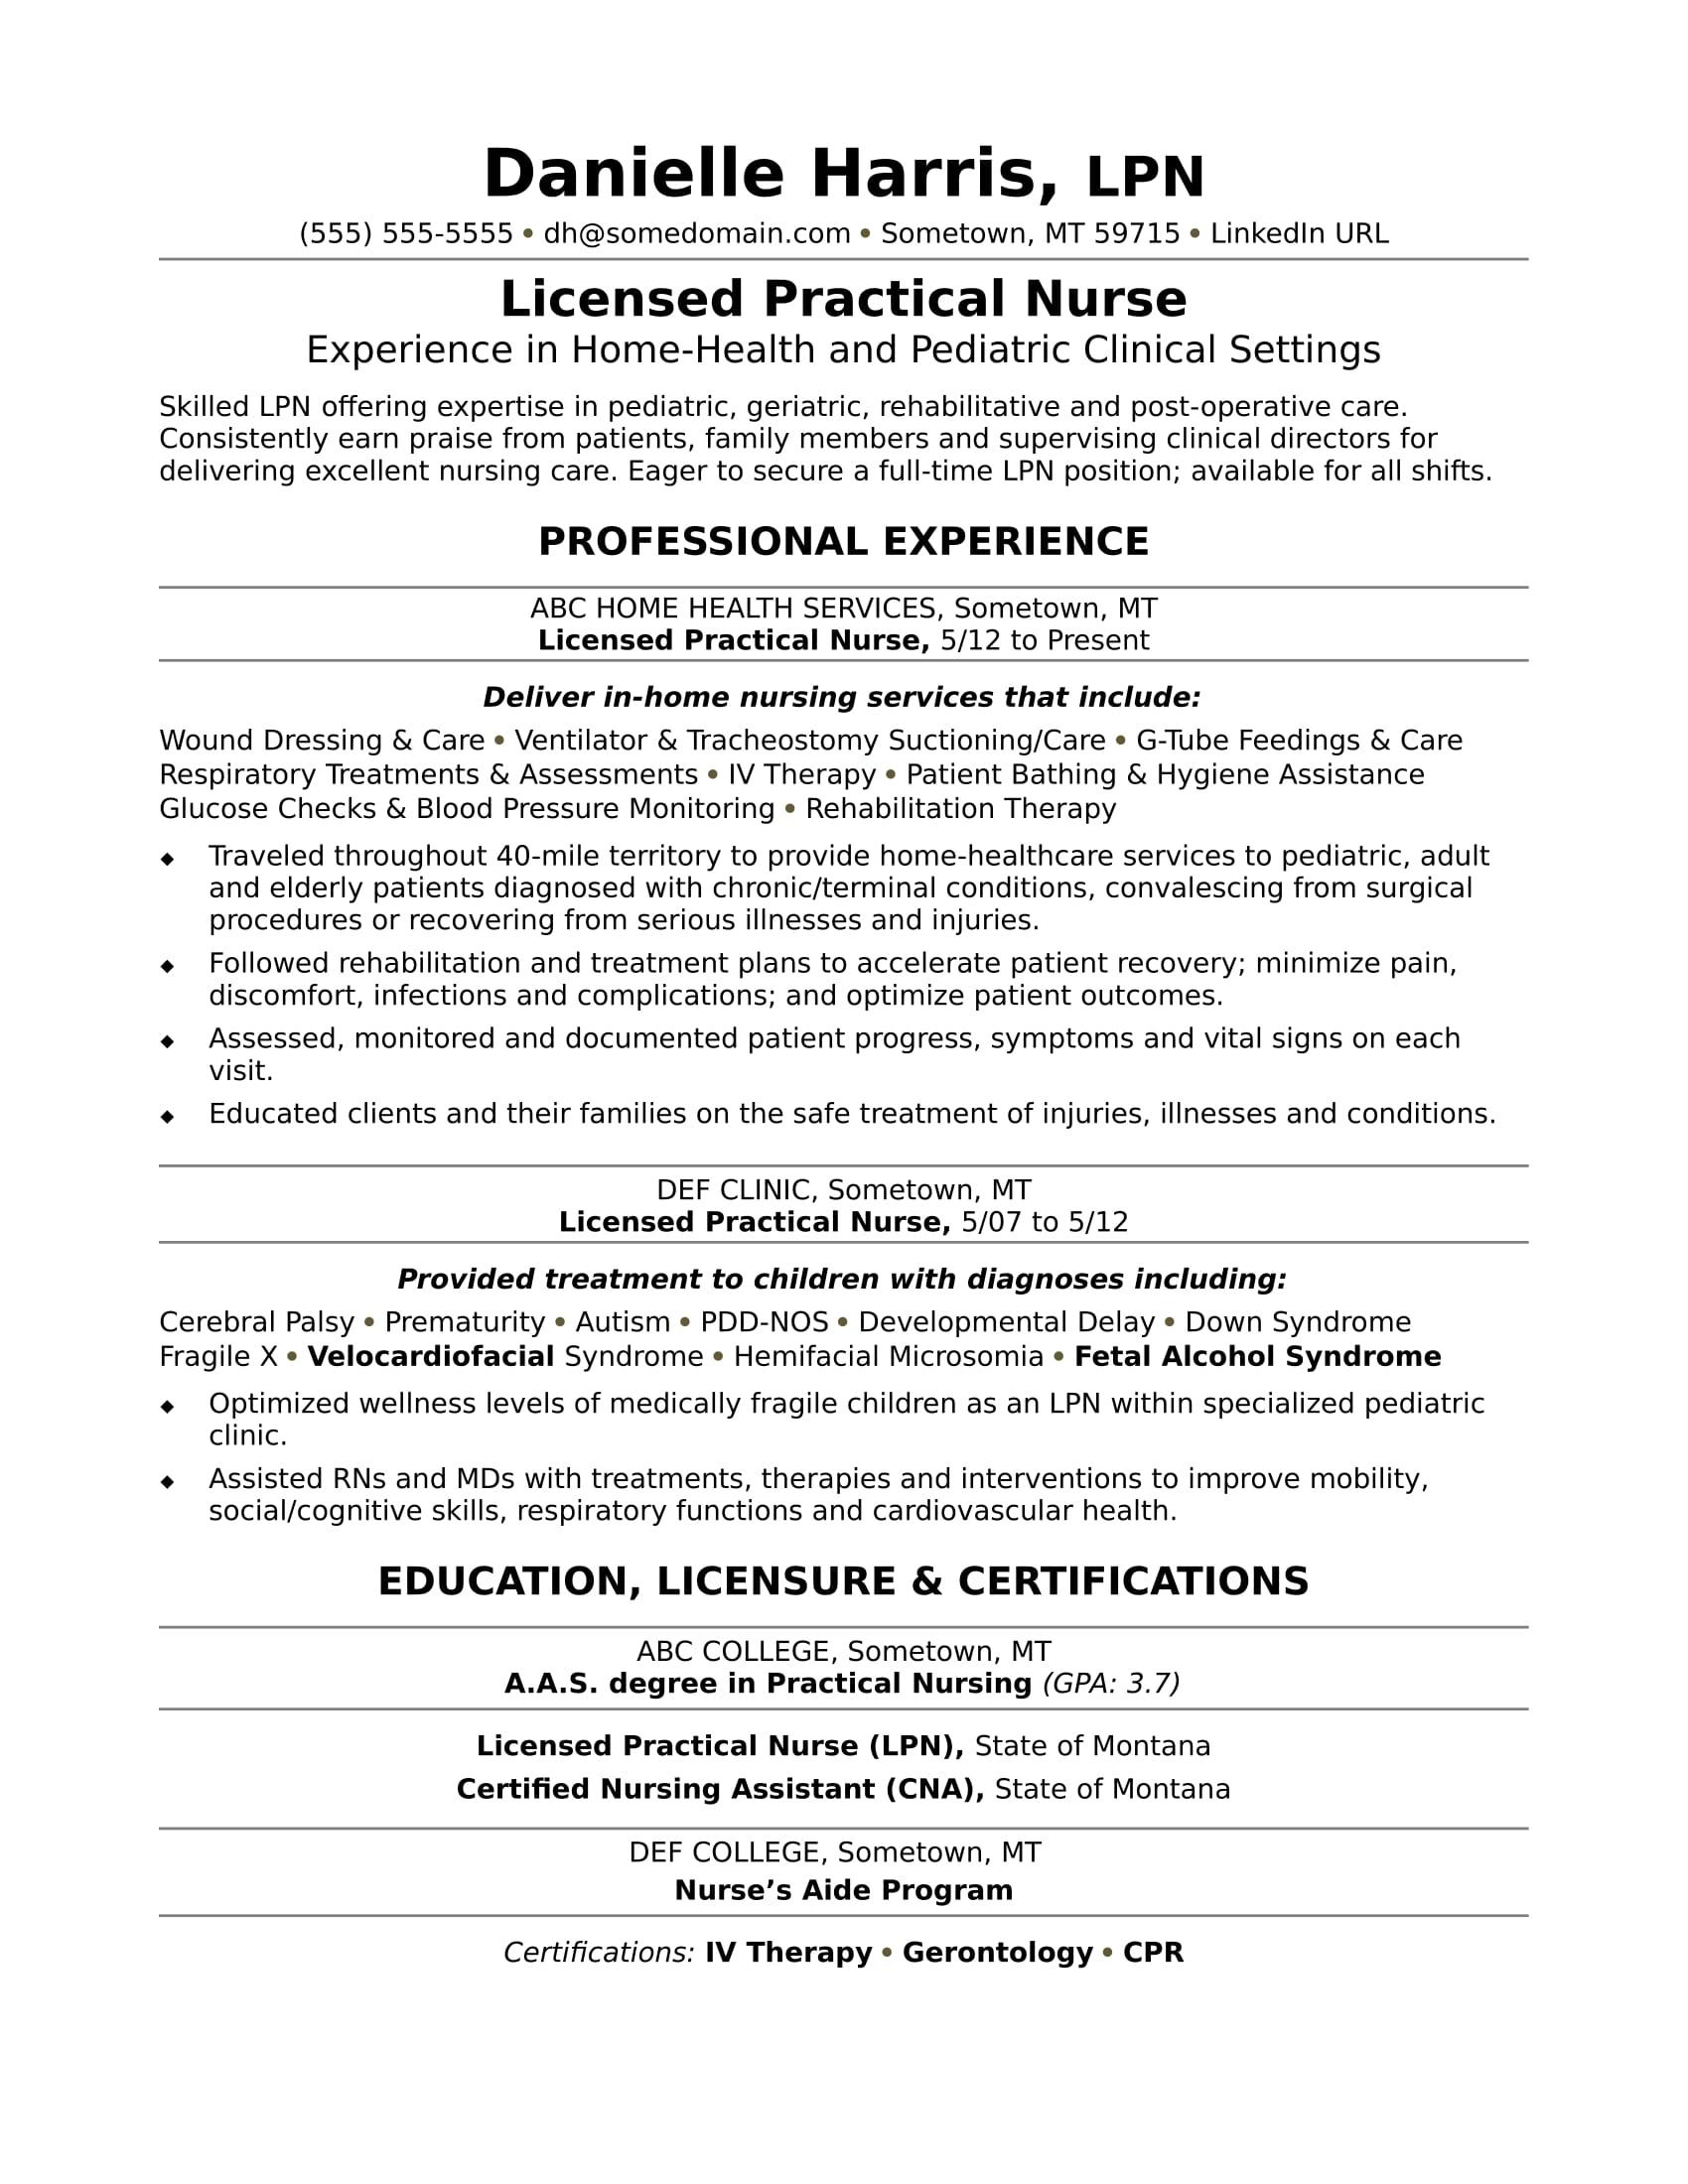 resume samples for lpn graduates